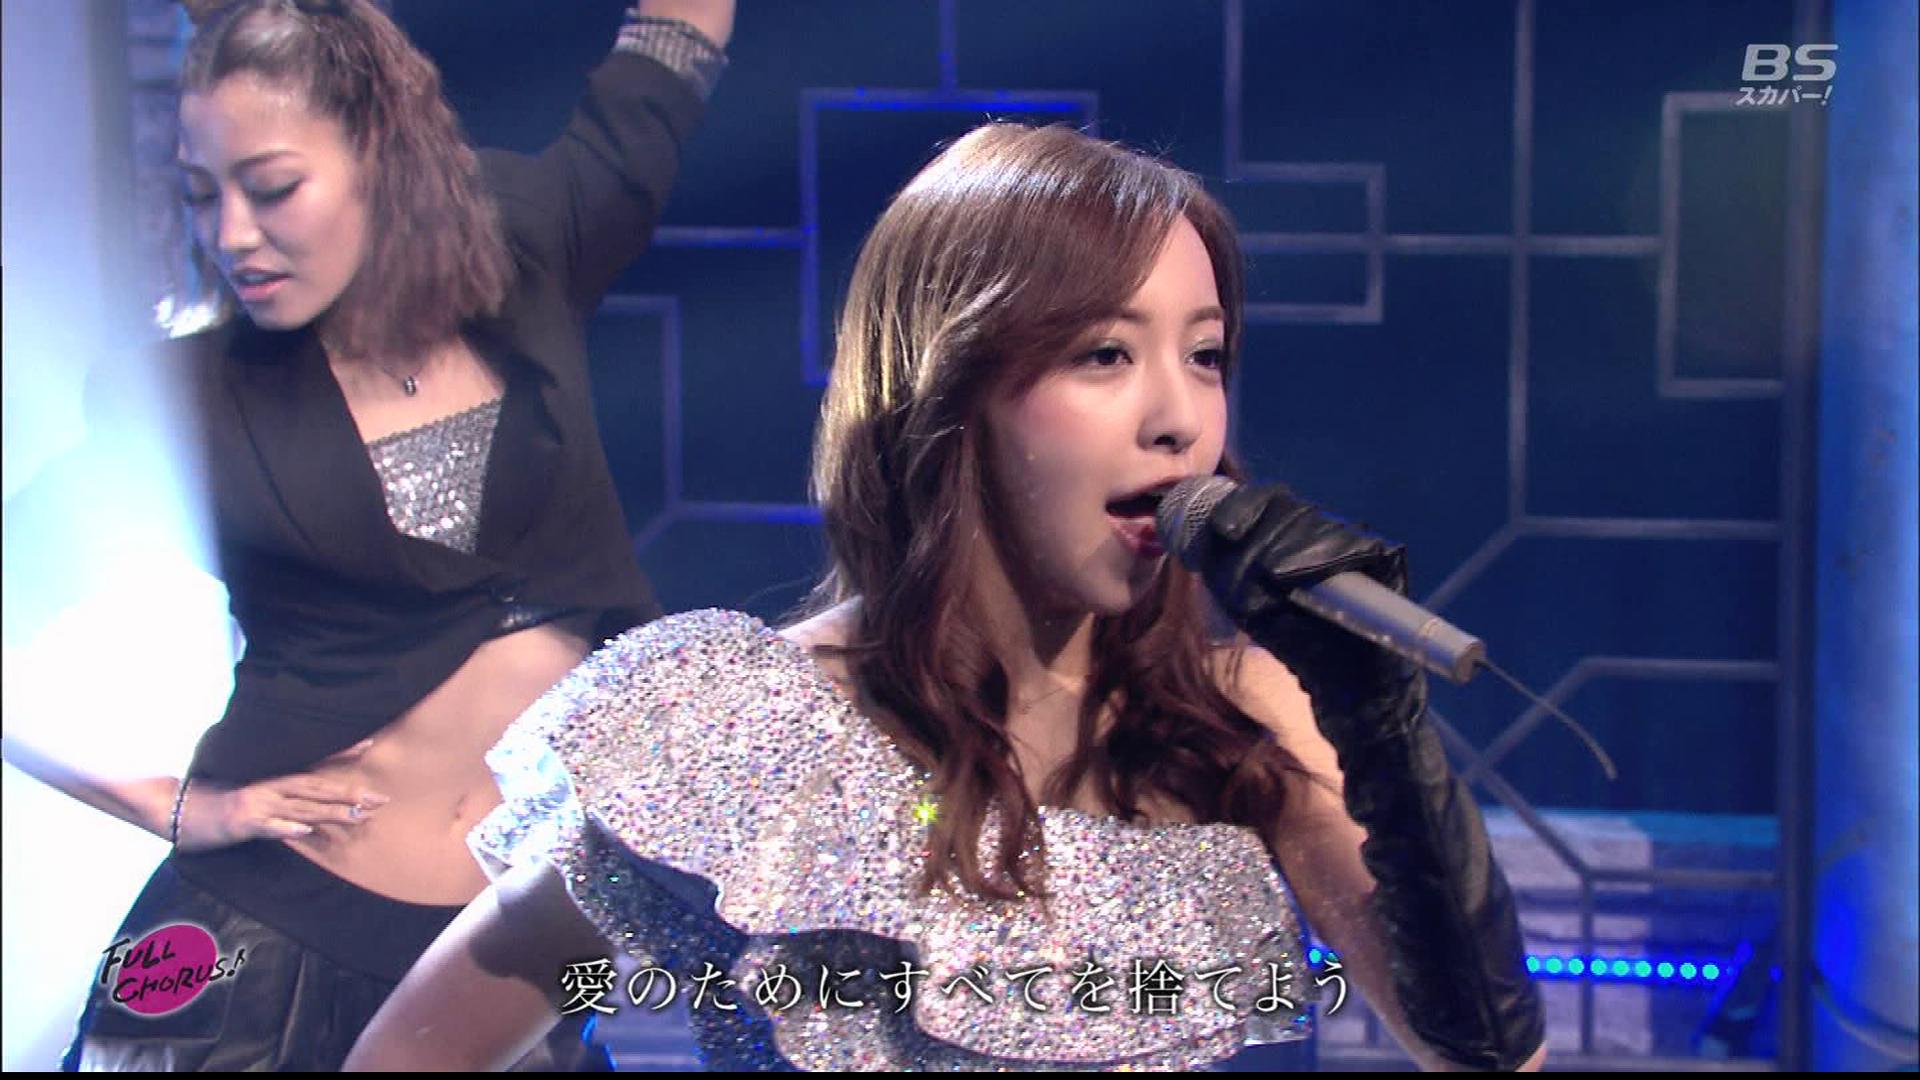 20160809.04.29 Tomomi Itano - Dear J (Full Chorus! 2015.06.30 HDTV) (JPOP.ru).ts 1.jpg